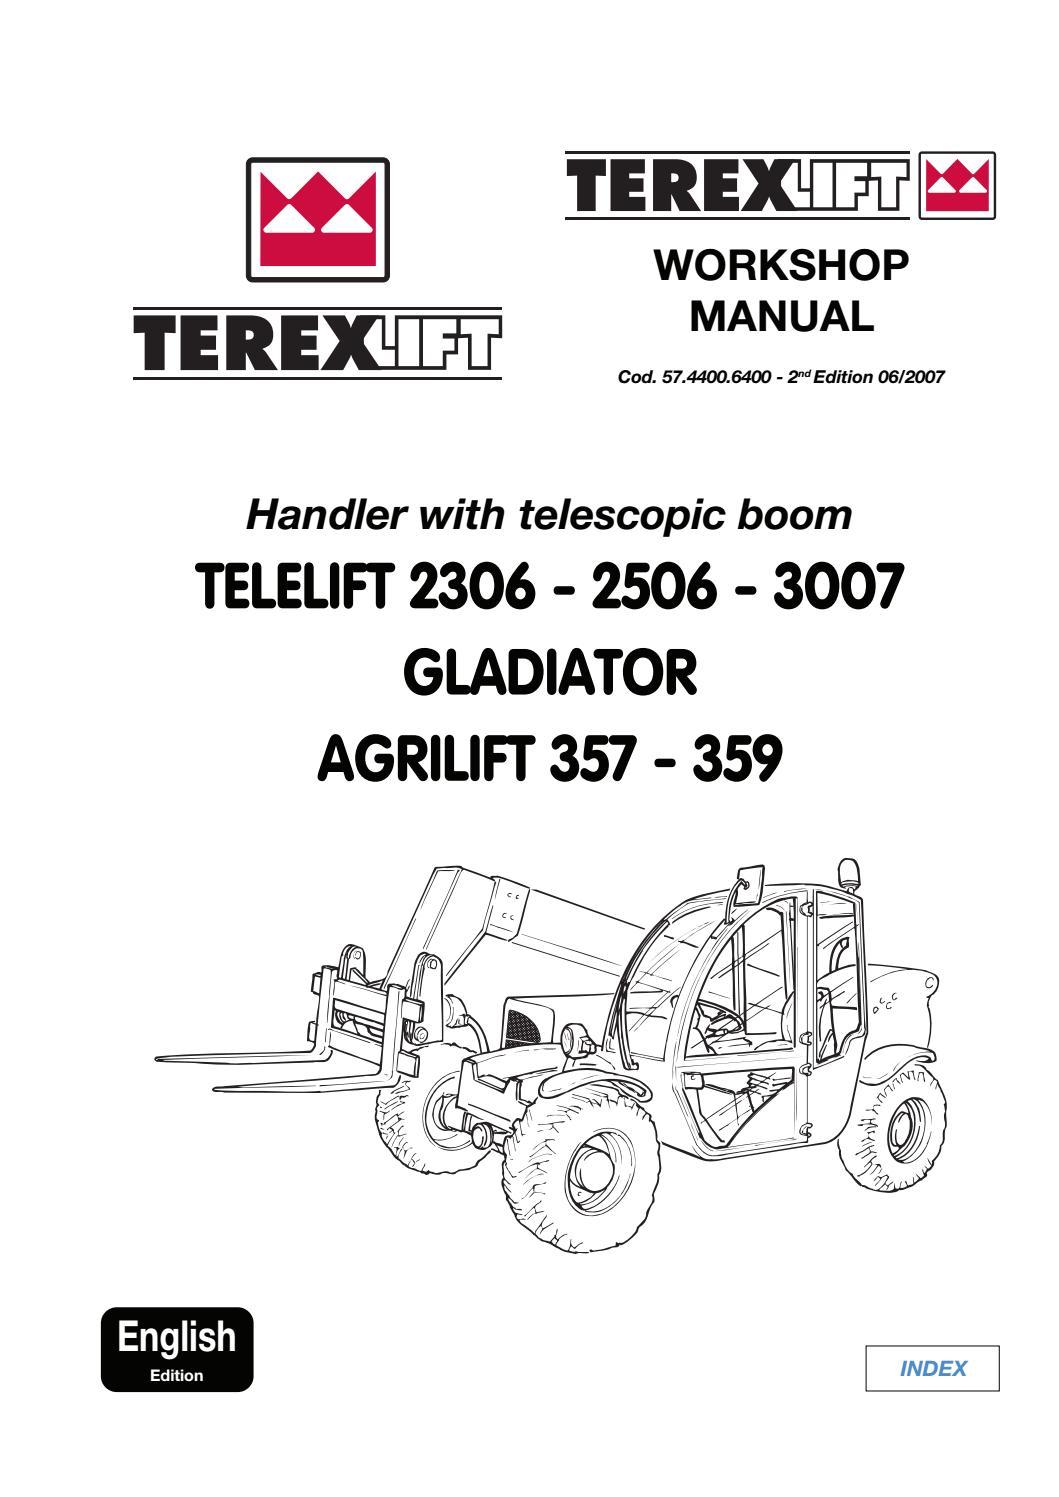 TEREX TELELIFT 2506 GLADIATOR AGRILIFT TELESCOPIC HANDLER